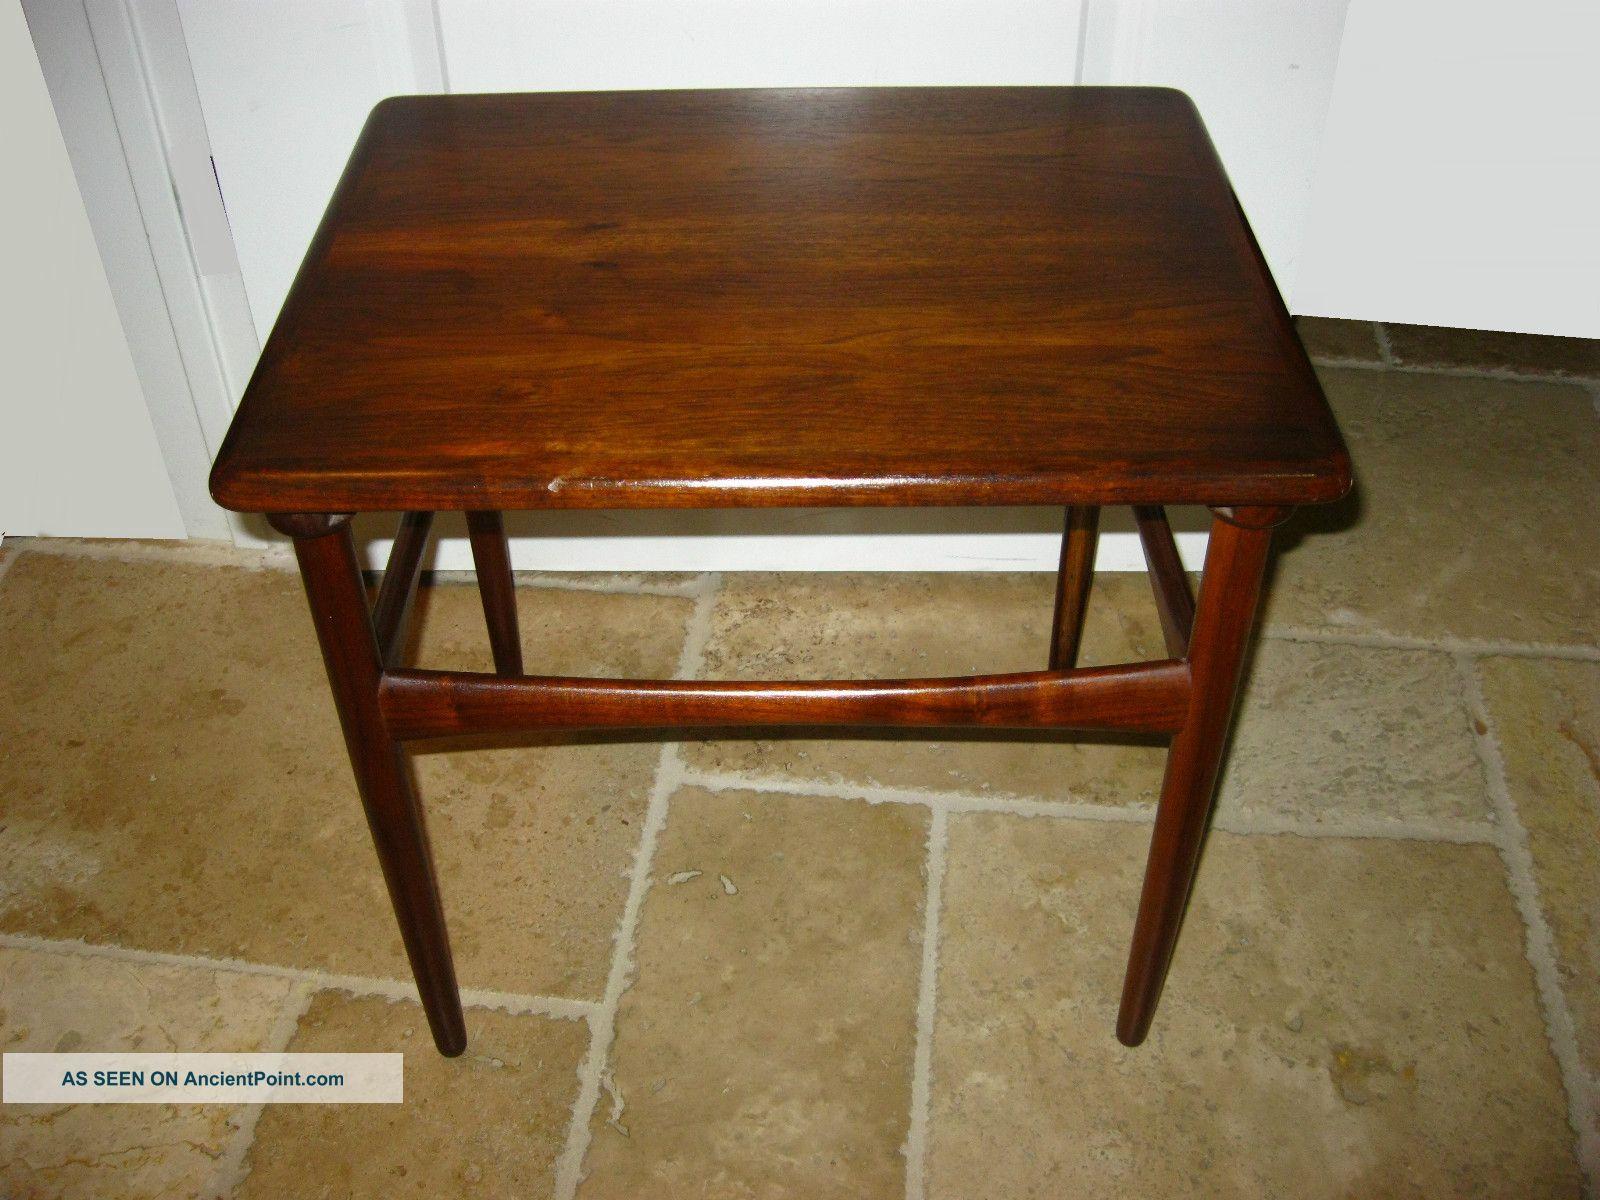 Vintage Danish Modern Teak Wood End Table Made In Denmark Coffee Table